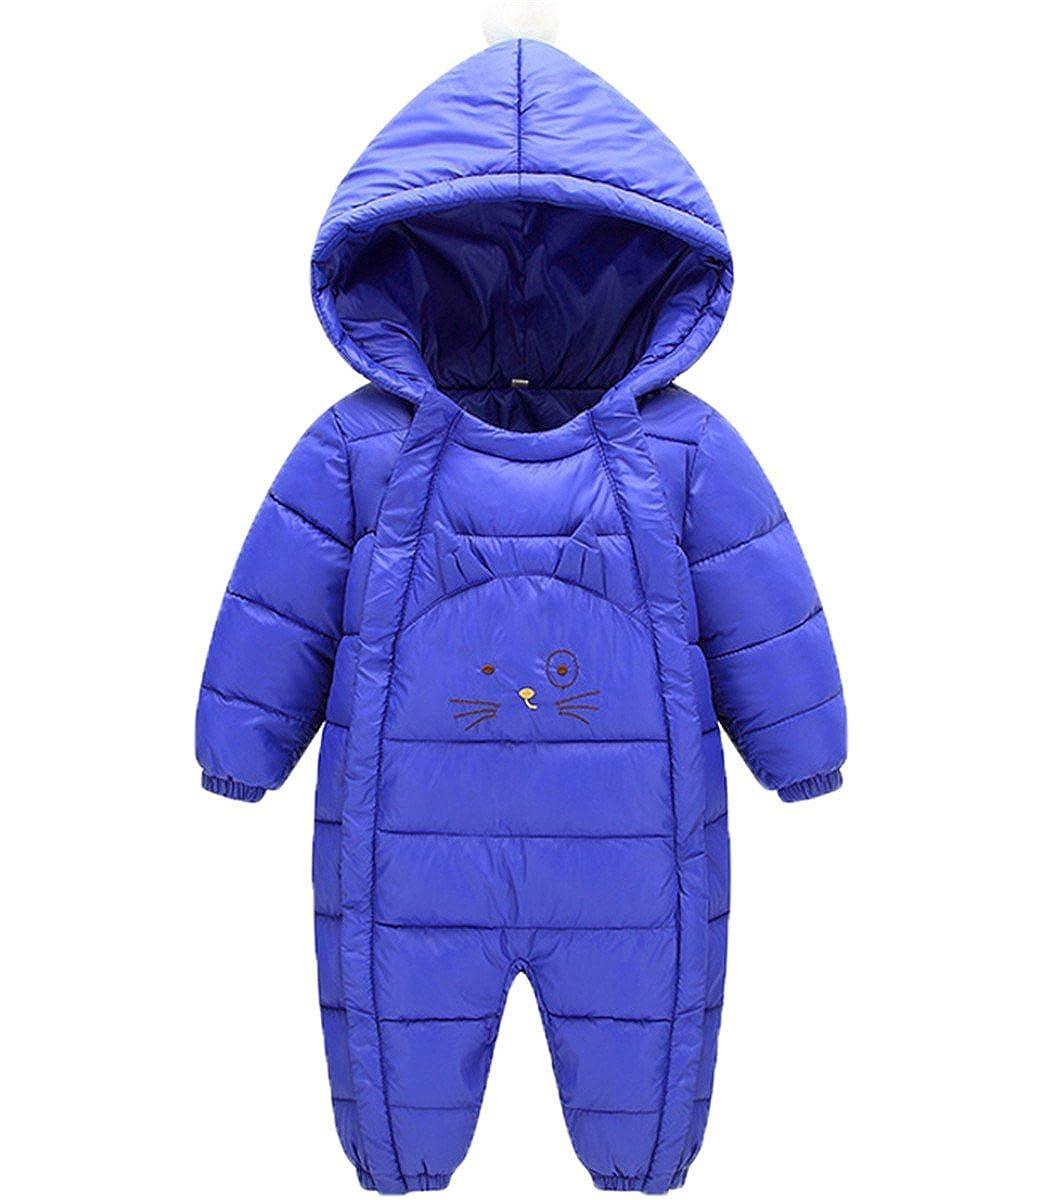 JELEUON Baby Girls Boys One Piece Cute Cat Winter Down Jacket Romper Jumpsuit